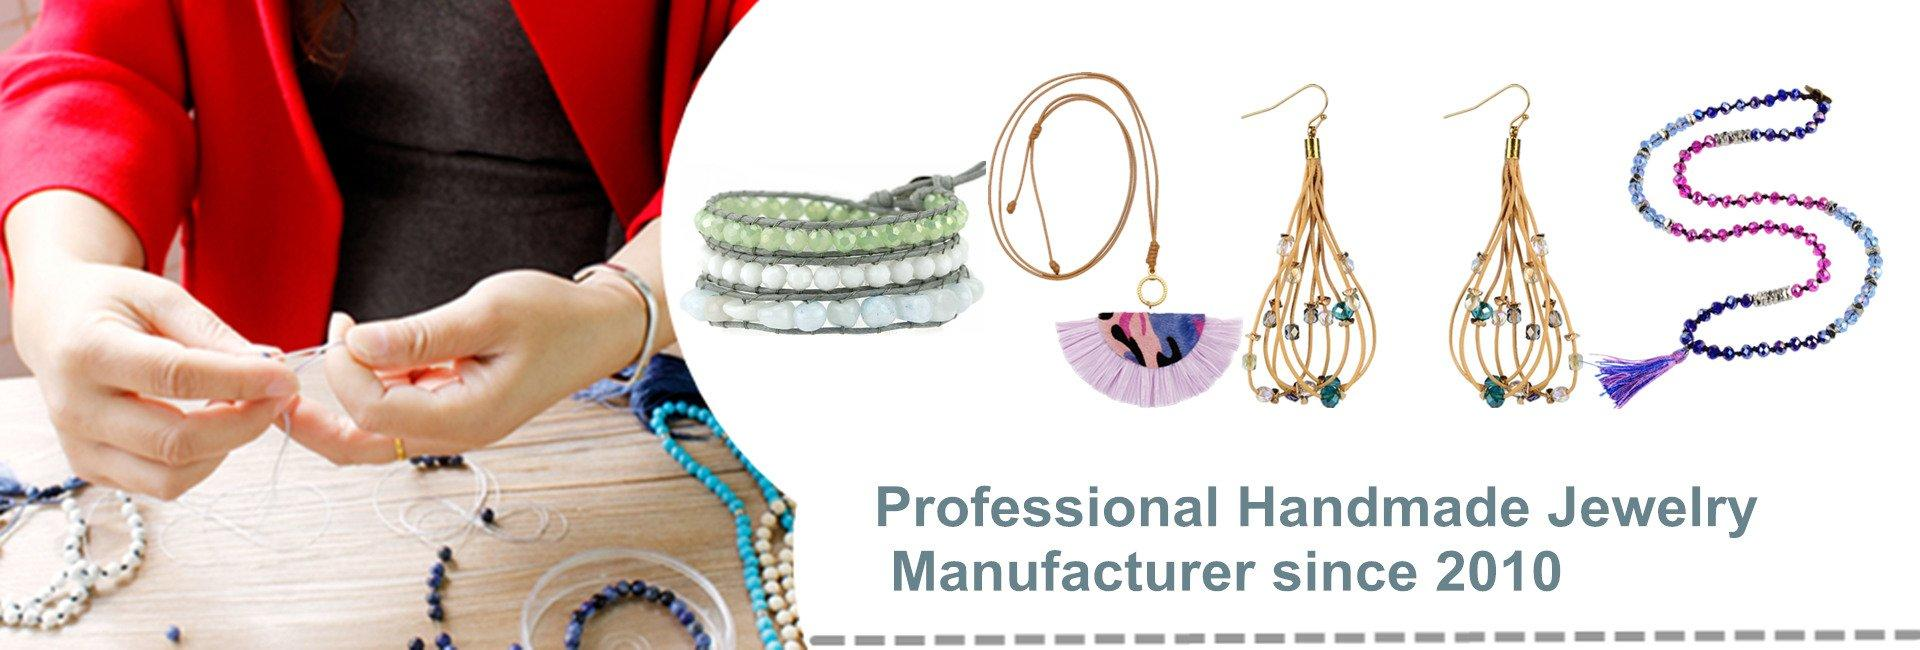 Handmade Jewelry Manufacturer